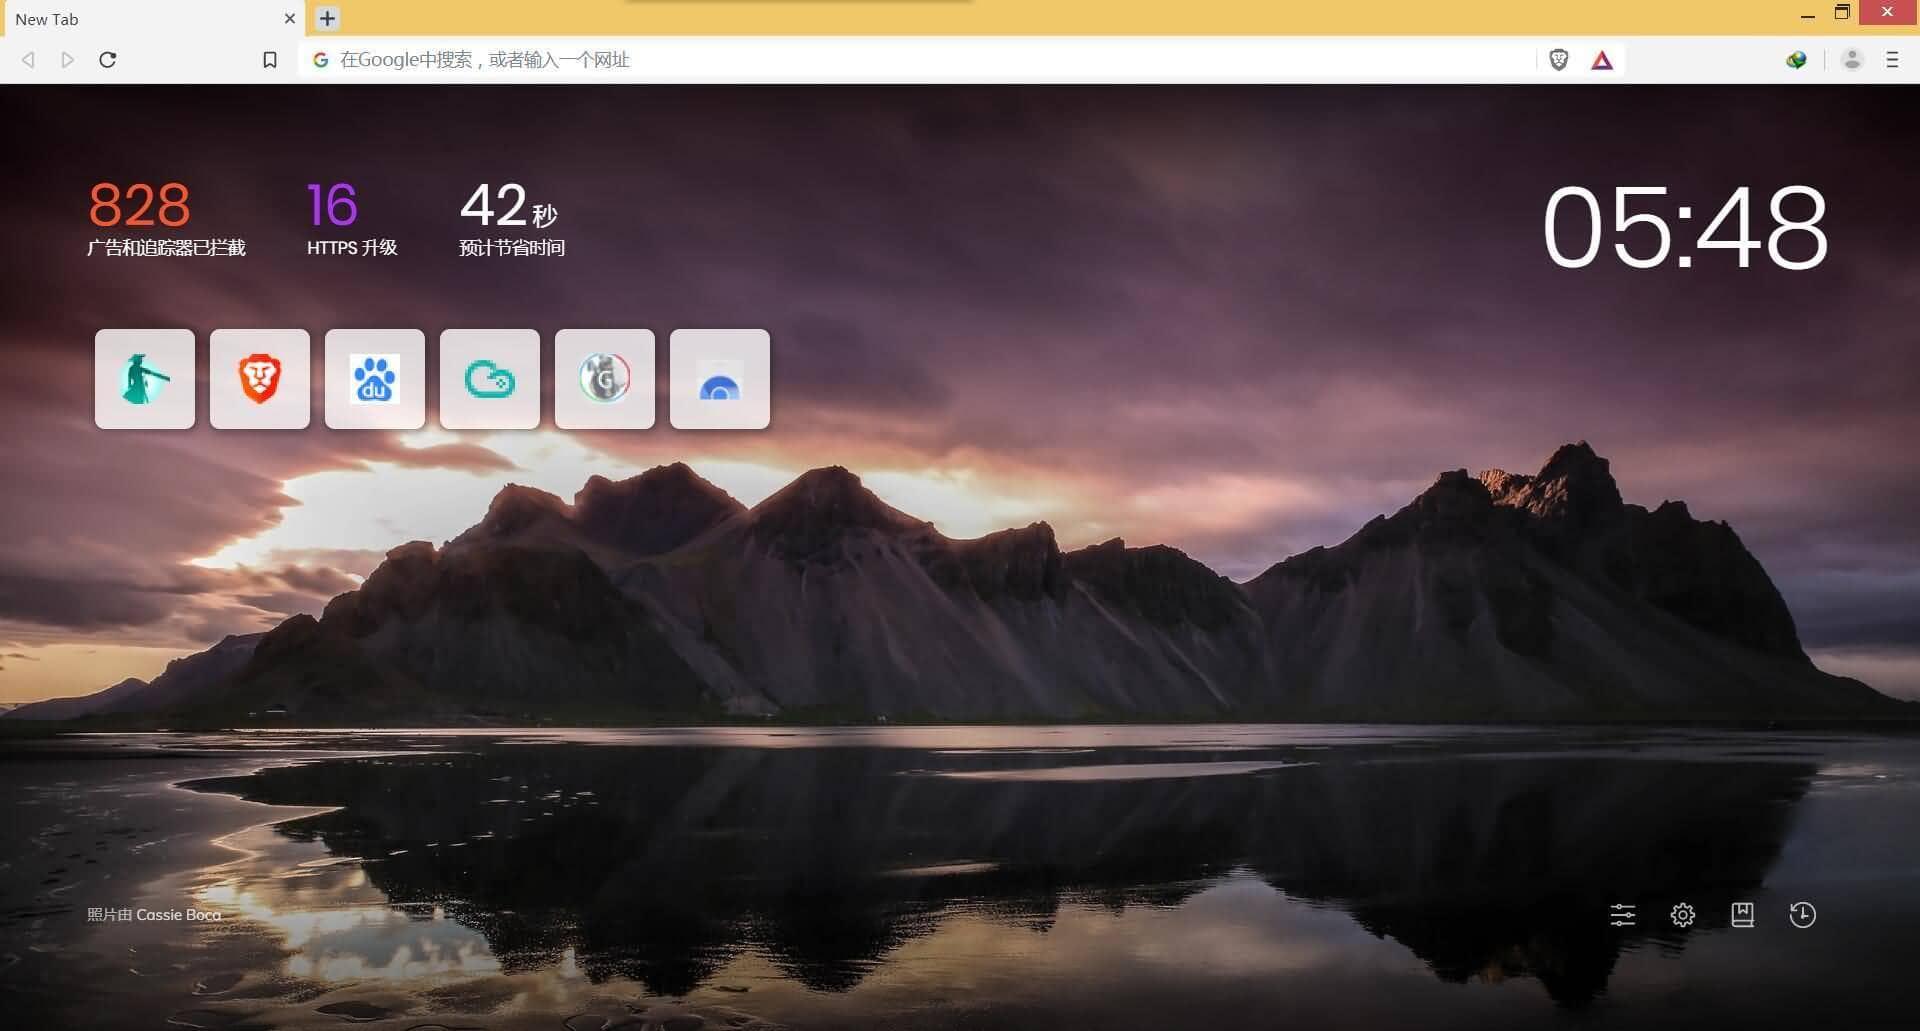 Brave浏览器0.68.131 (高速、安全、支持插件)